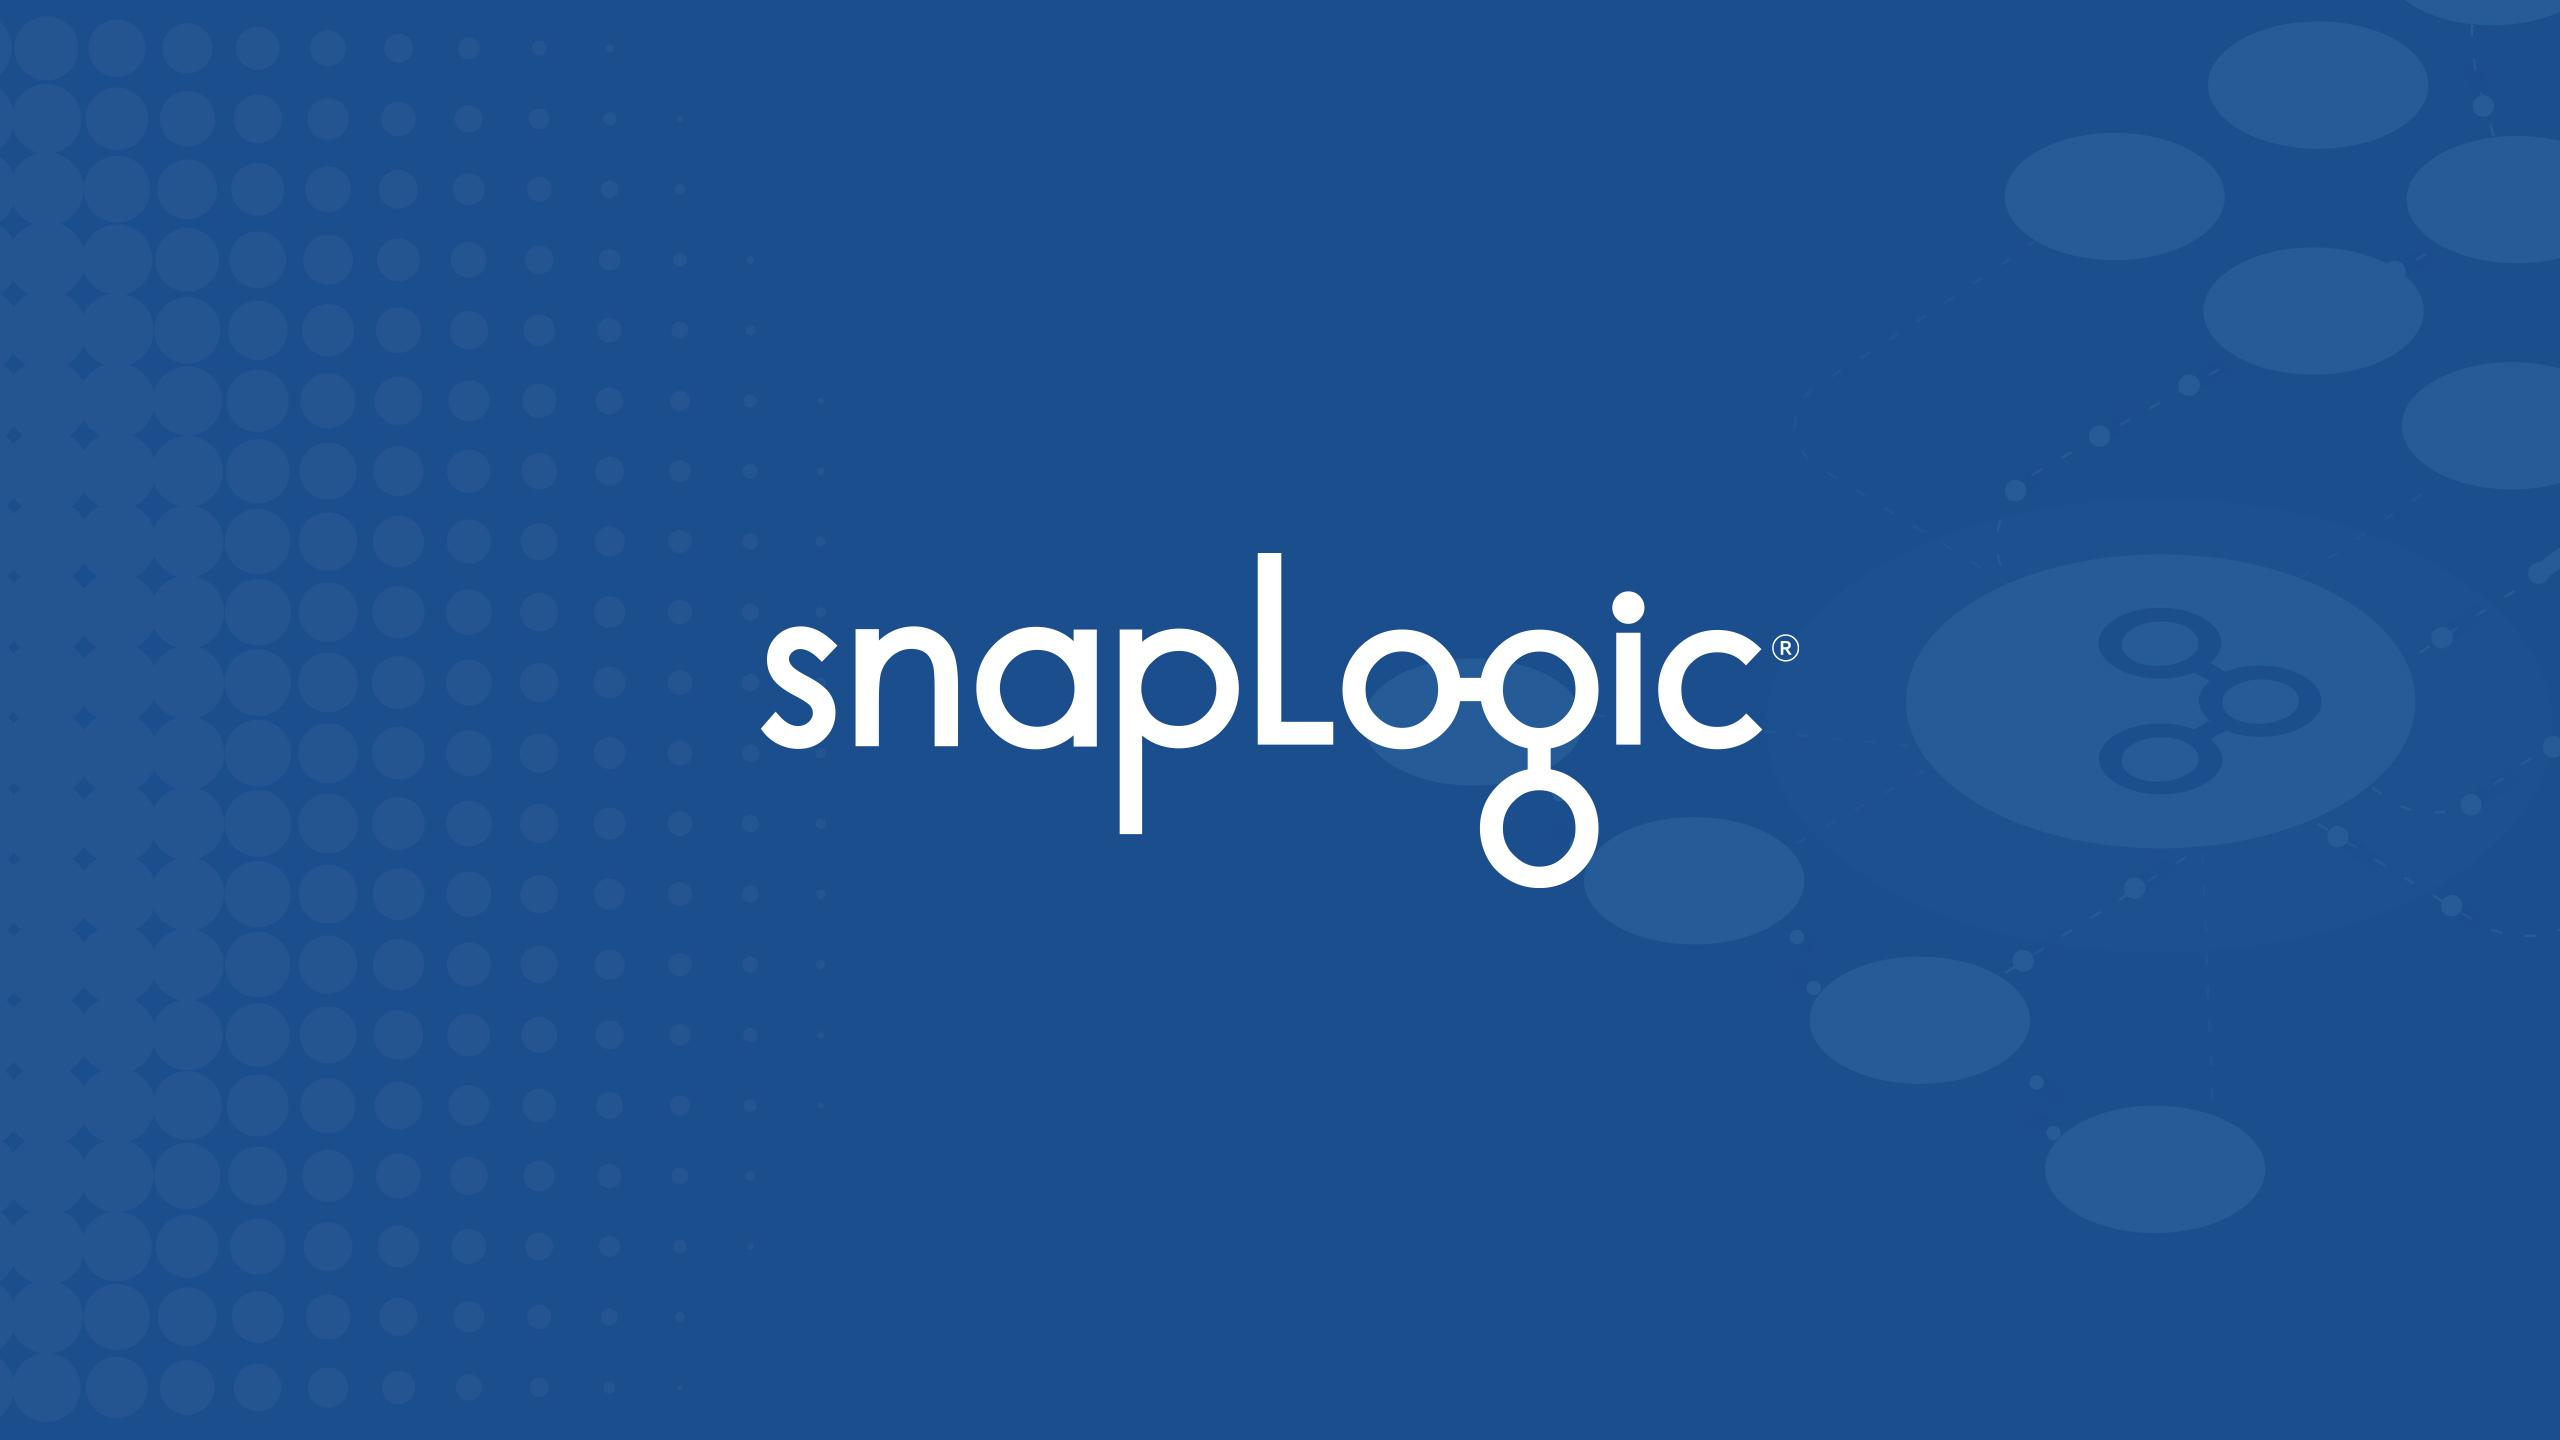 SnapLogic Intelligent Integration Platform (IIP)